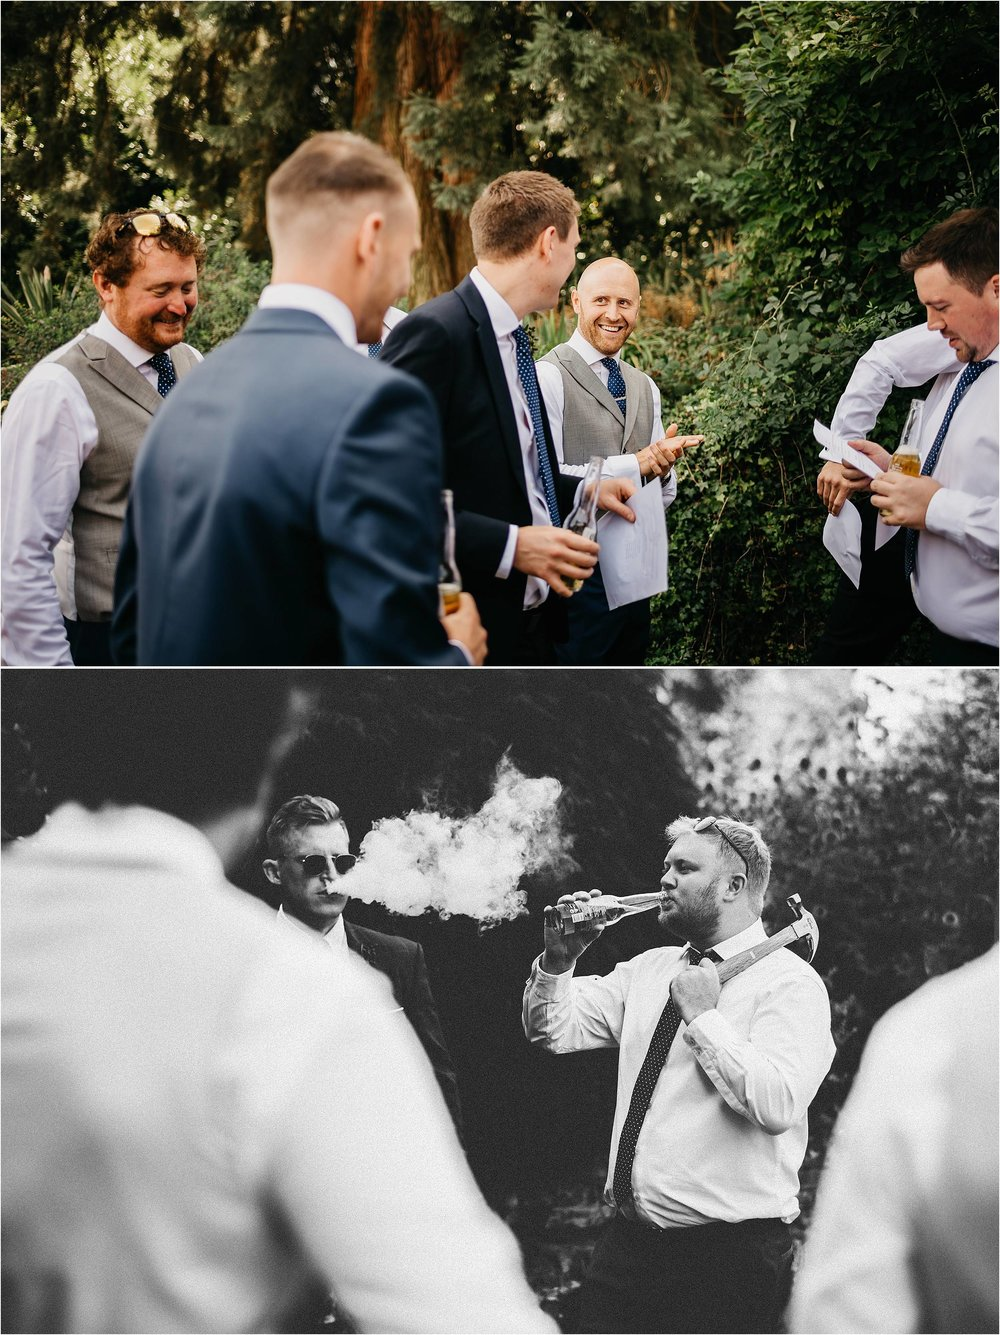 Essex Wedding Photography_0010.jpg